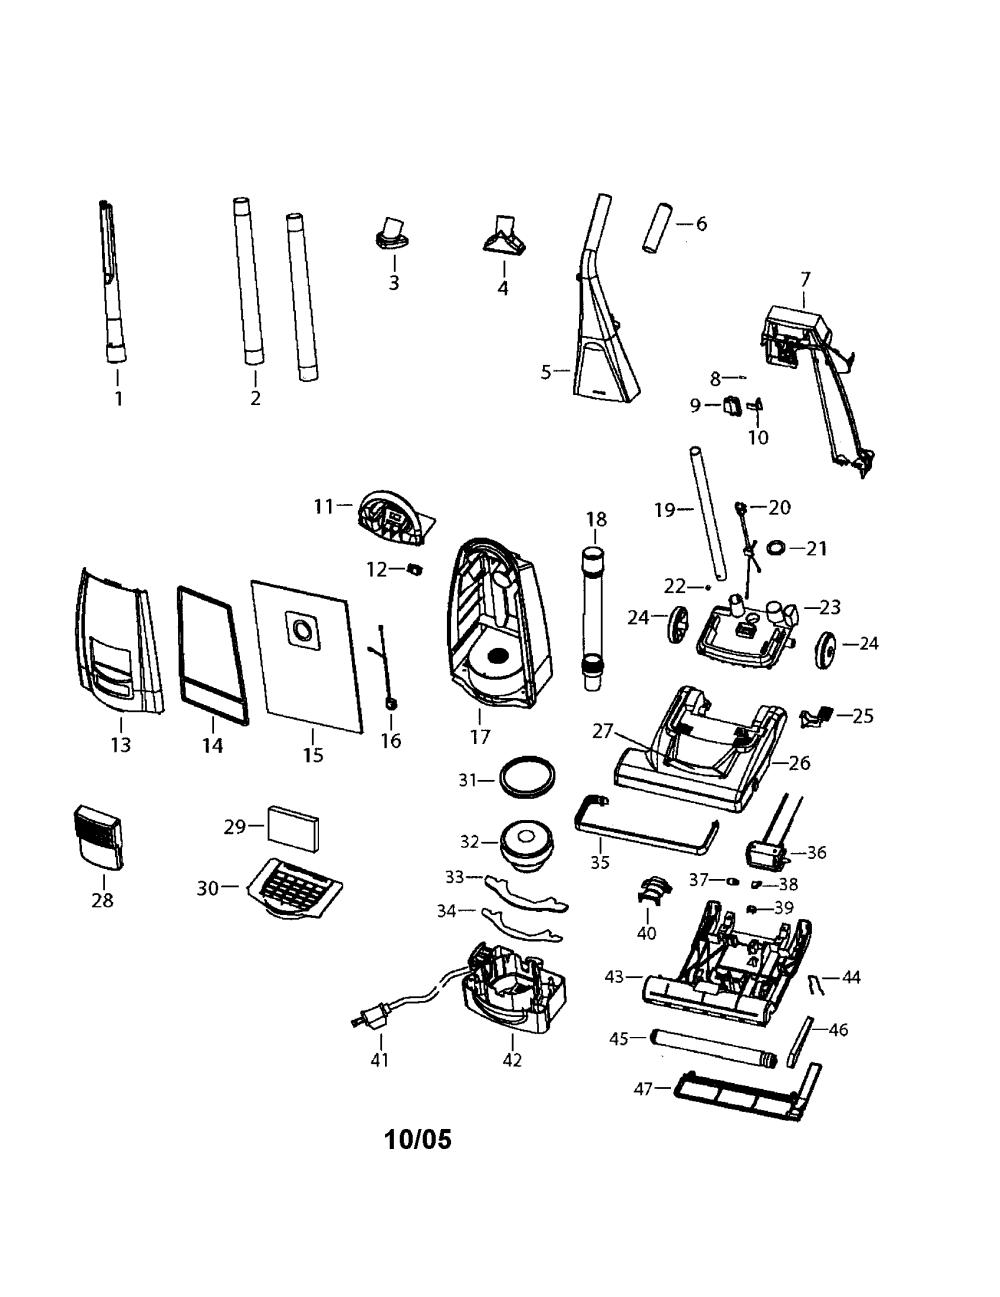 medium resolution of bissell carpet cleaner parts diagram bissell vacuum parts diagram vacuum cleaner diagram vacuum cleaner wiring diagrams